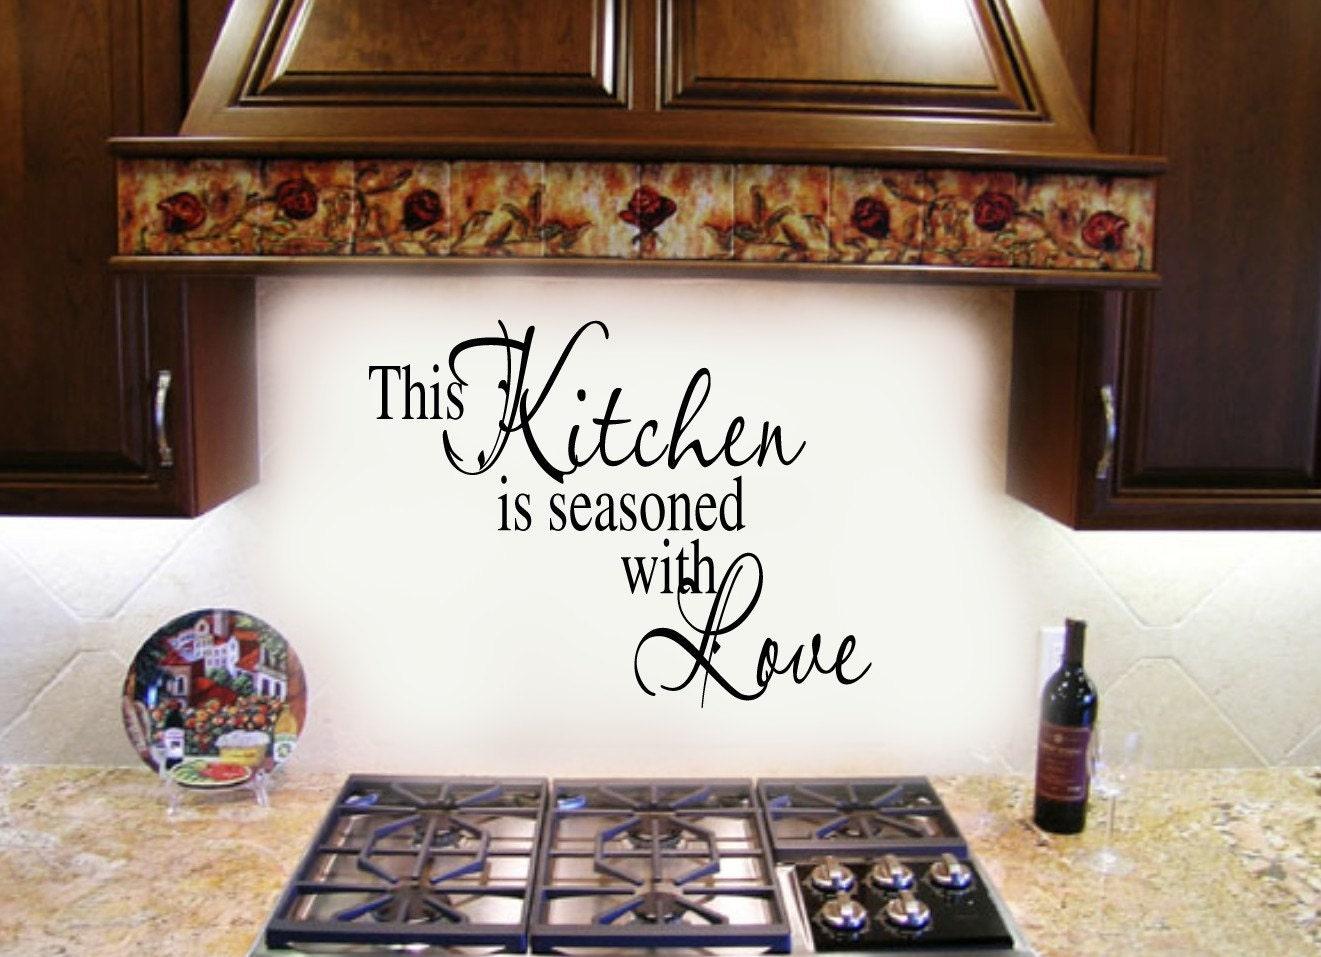 Esta cocina está sazonada con Quote Pared amor Decal ()